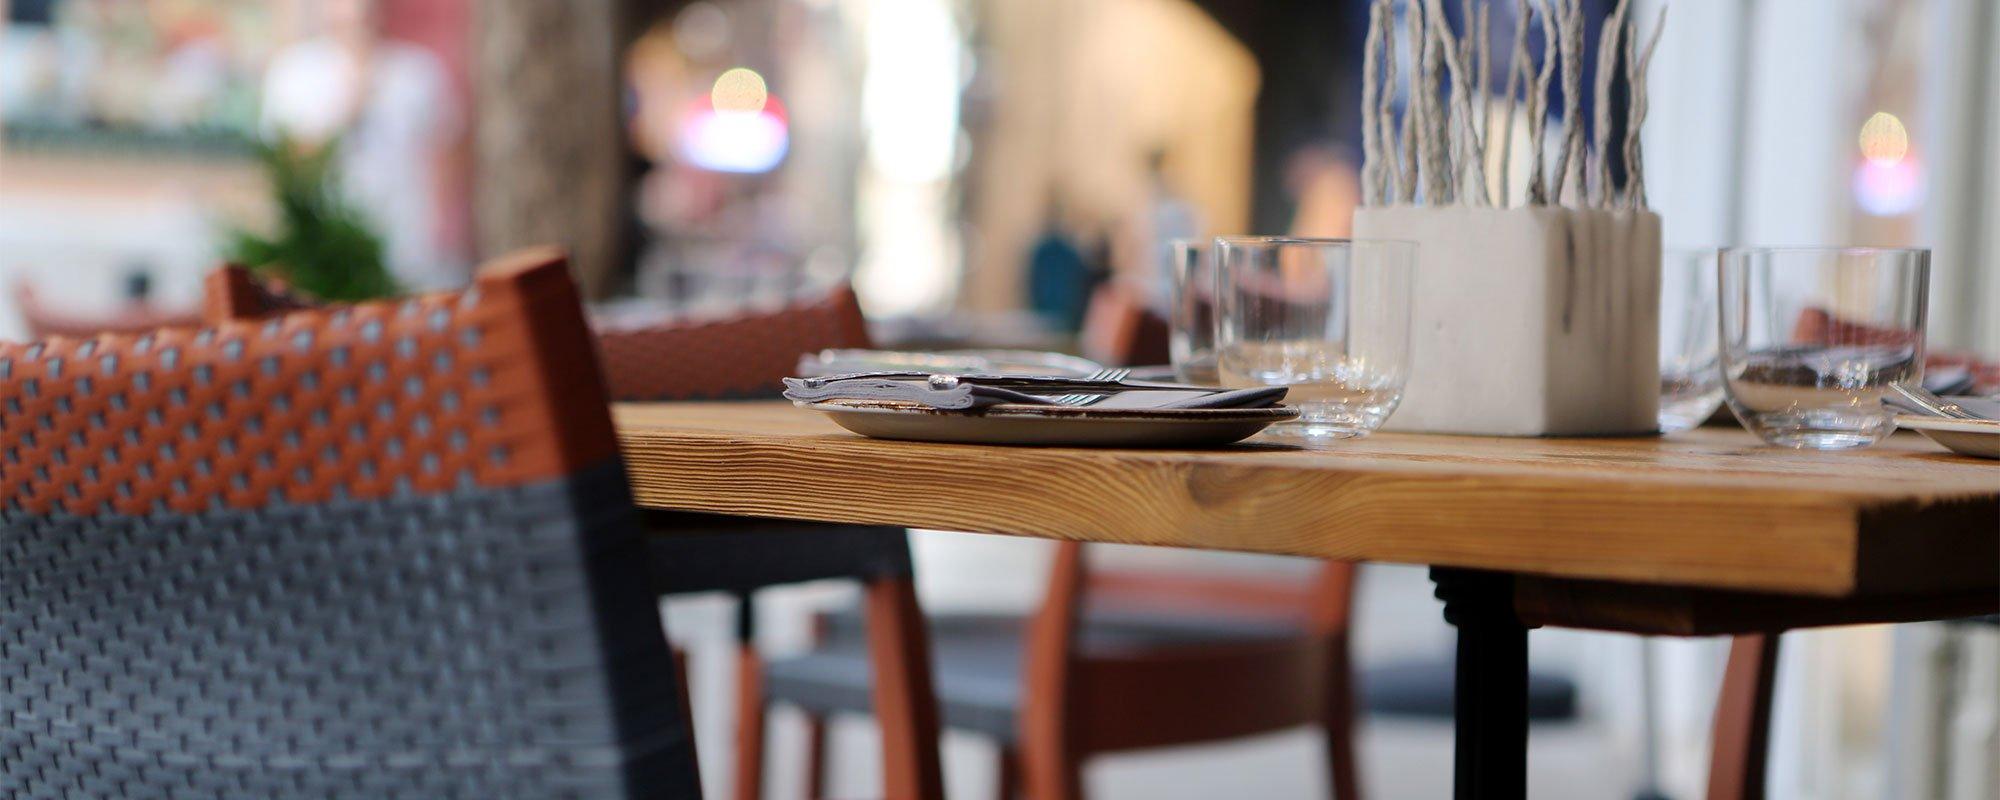 restaurant-table-main